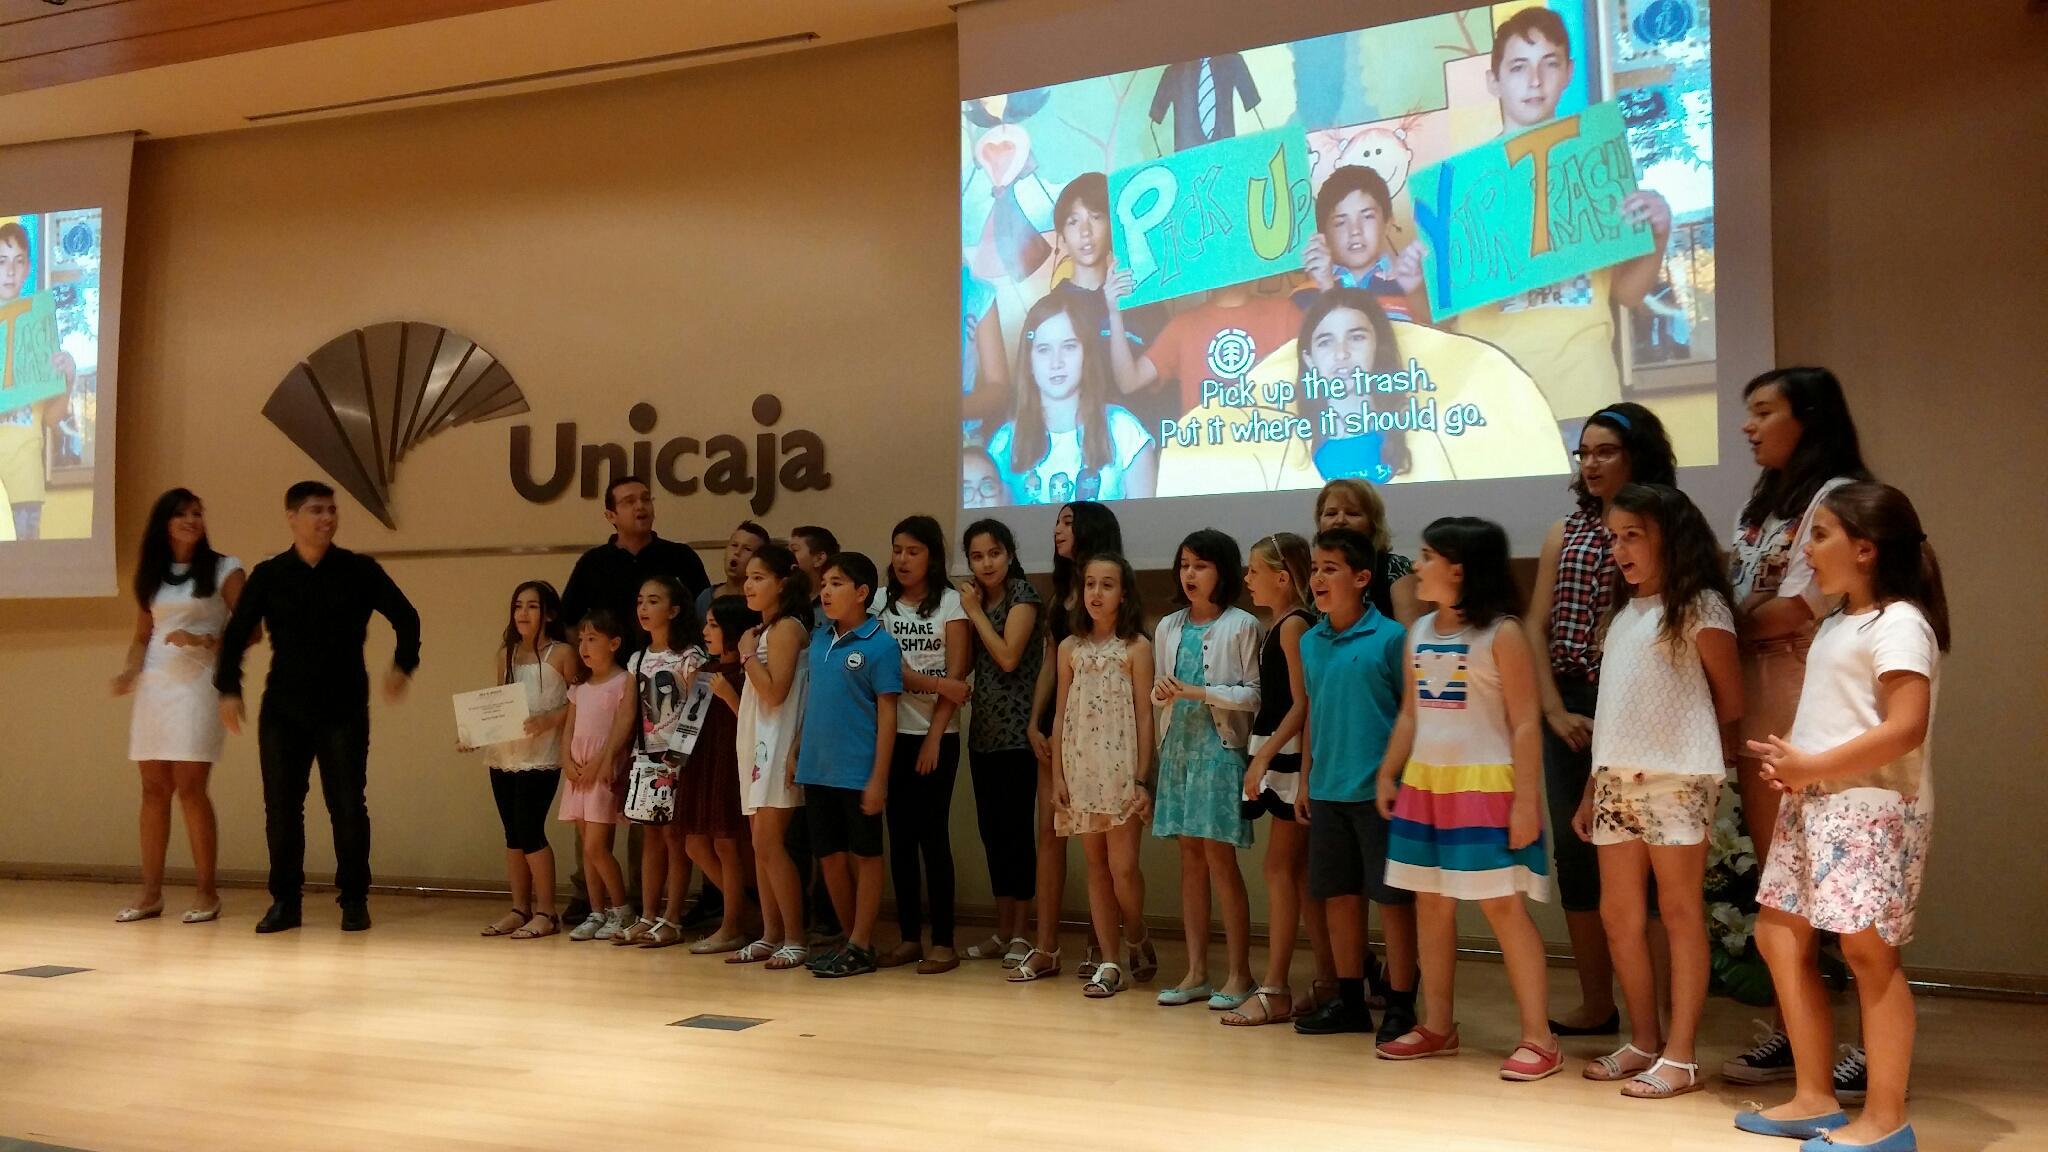 Una gala de #eduvideocreacion muy musical http://t.co/NfRt4oMeeP